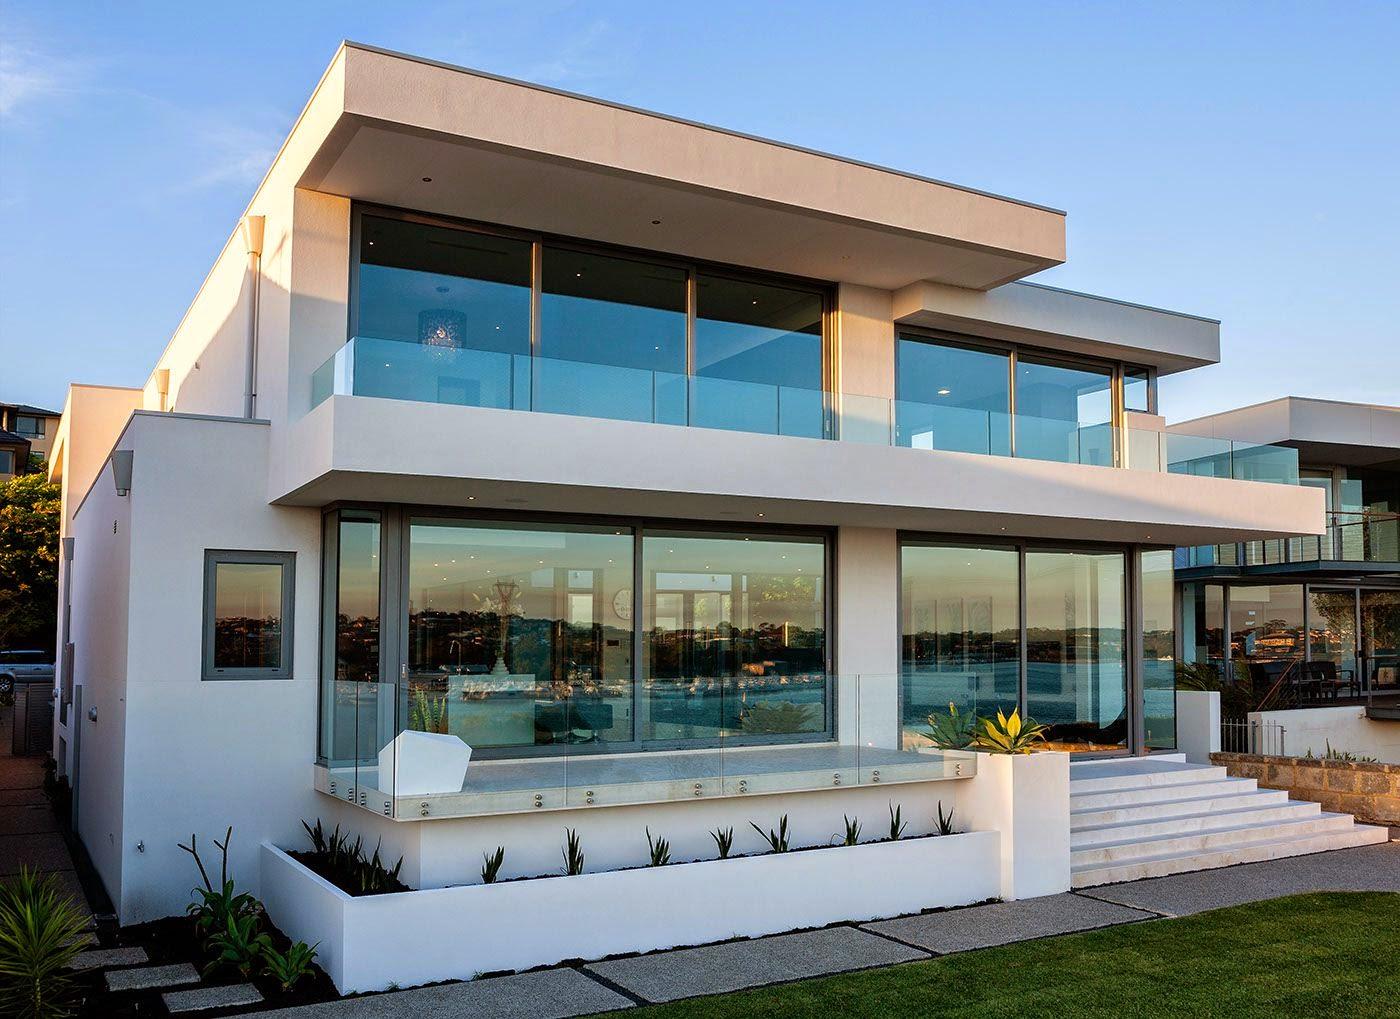 Hogares frescos relajada y acogedora moderna casa de la for Casa modern